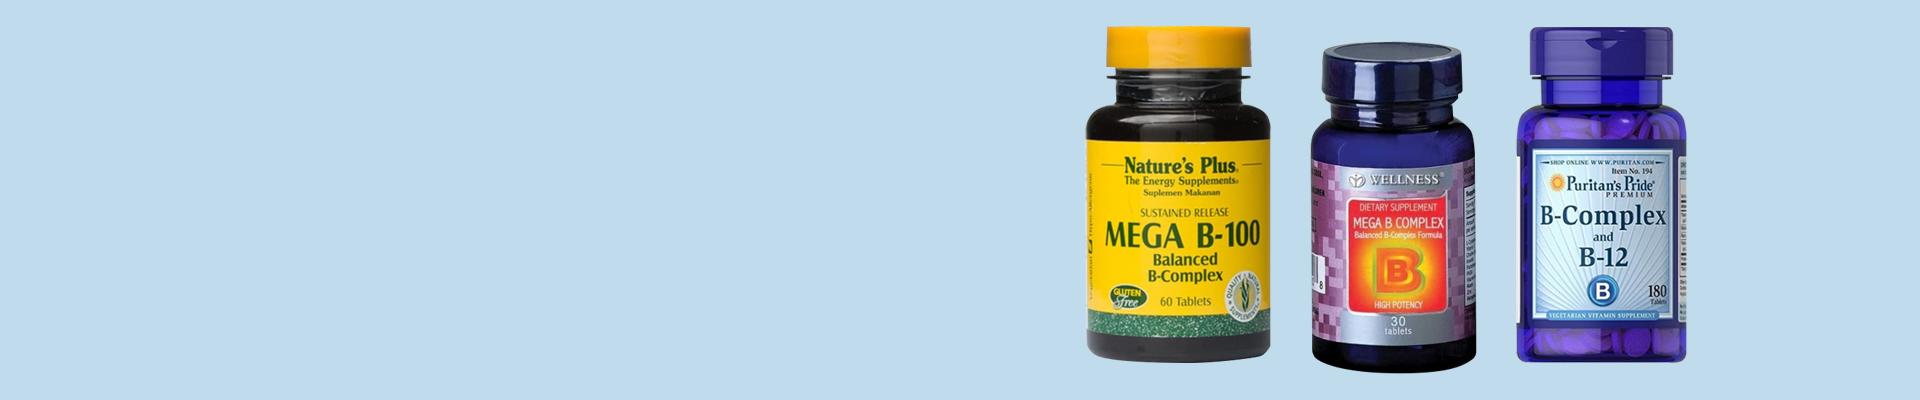 Jual Vitamin B Online - Multivitamin Terlengkap